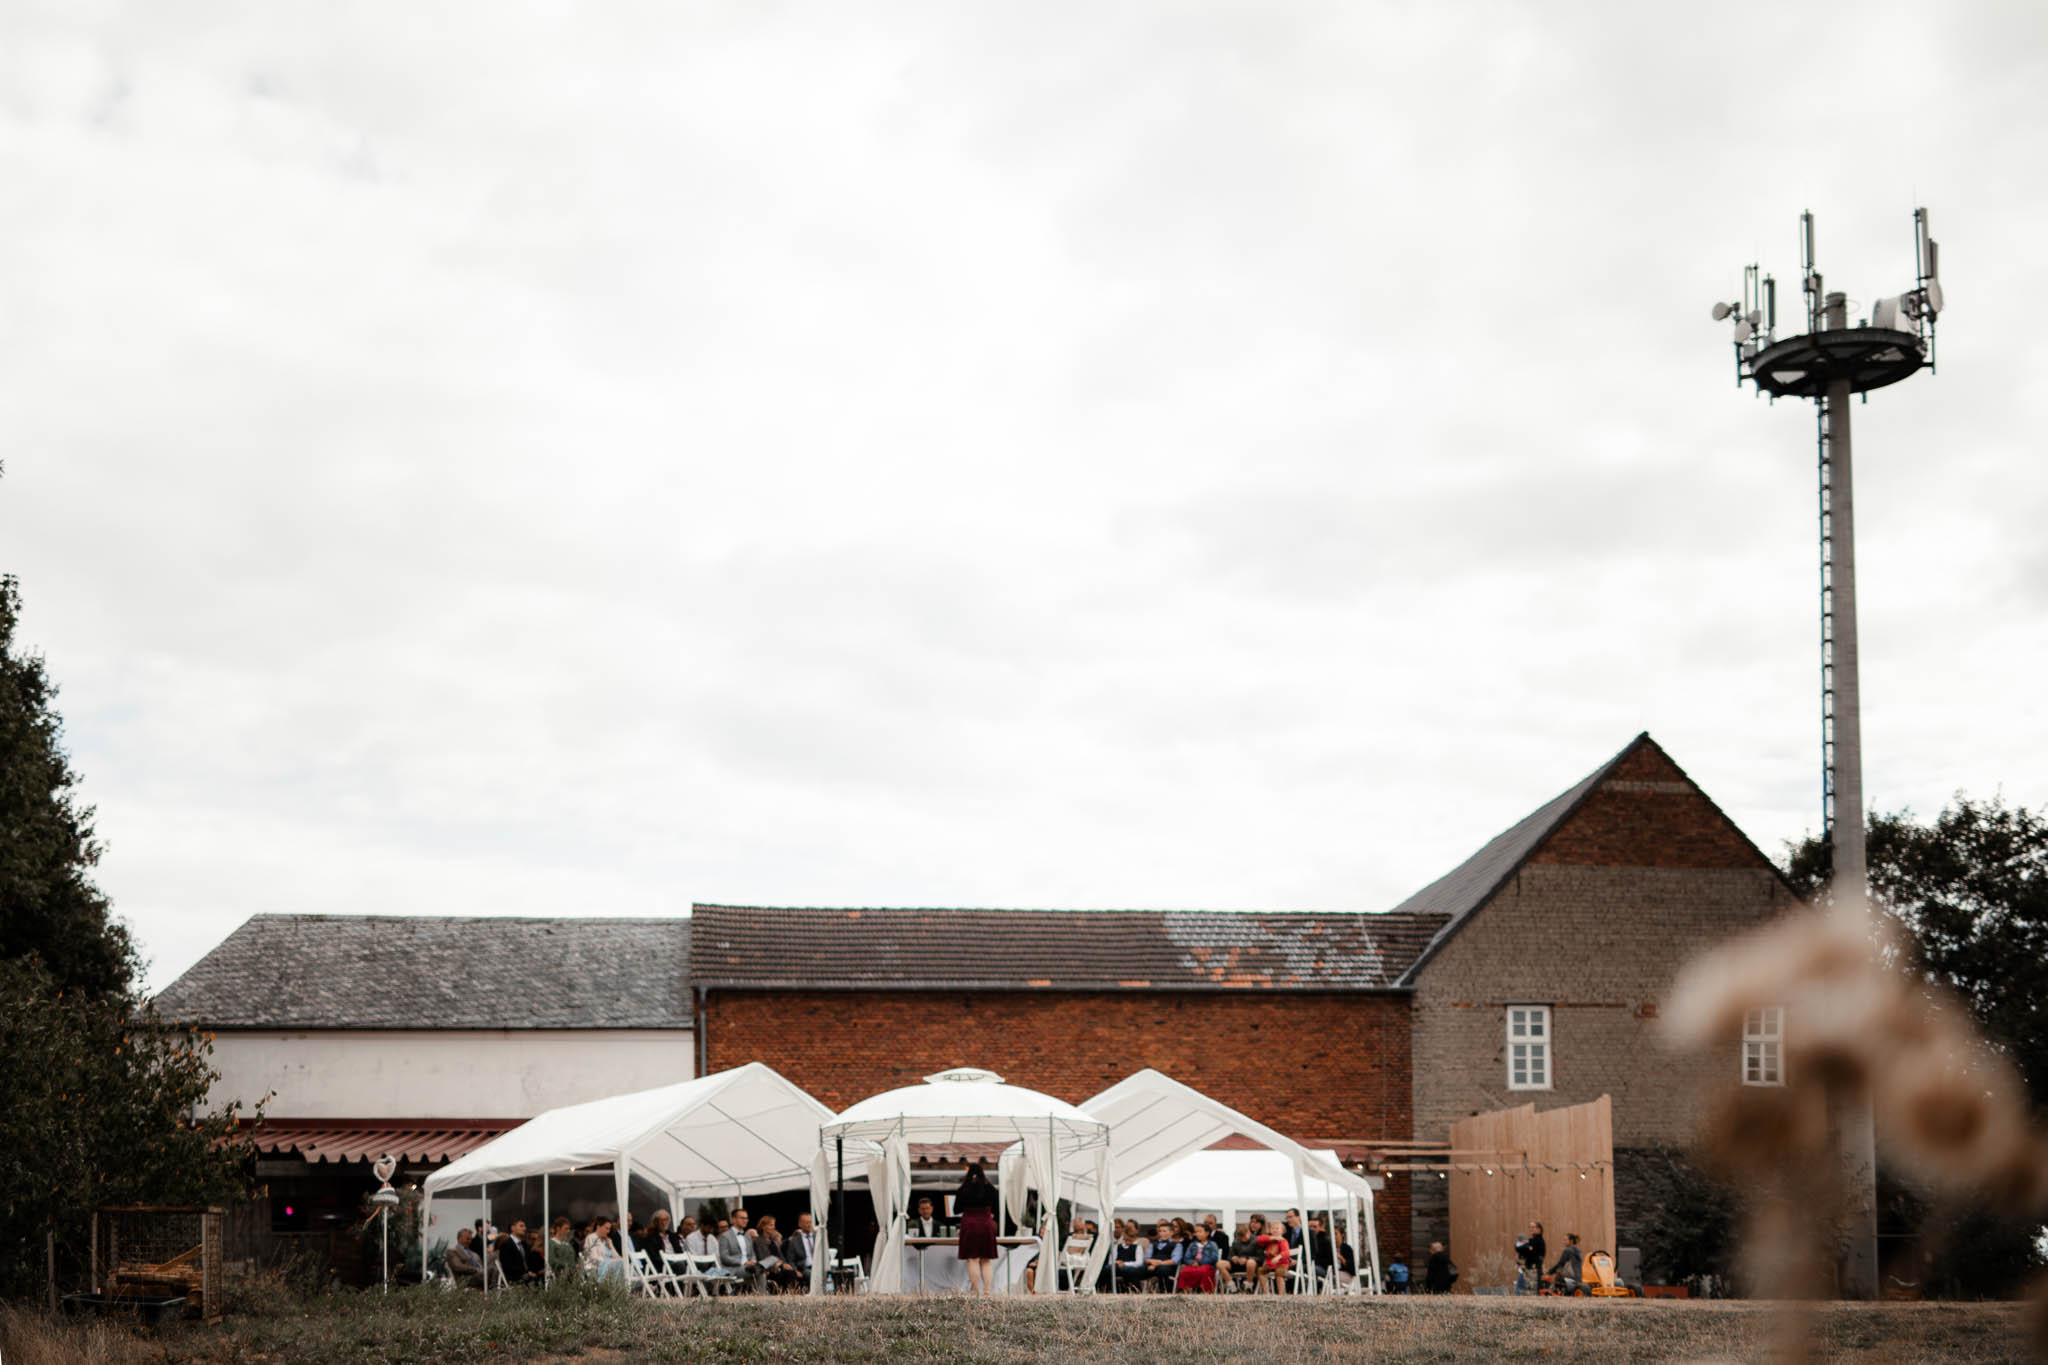 Hochzeitsfotograf Limburg an der Lahn 16